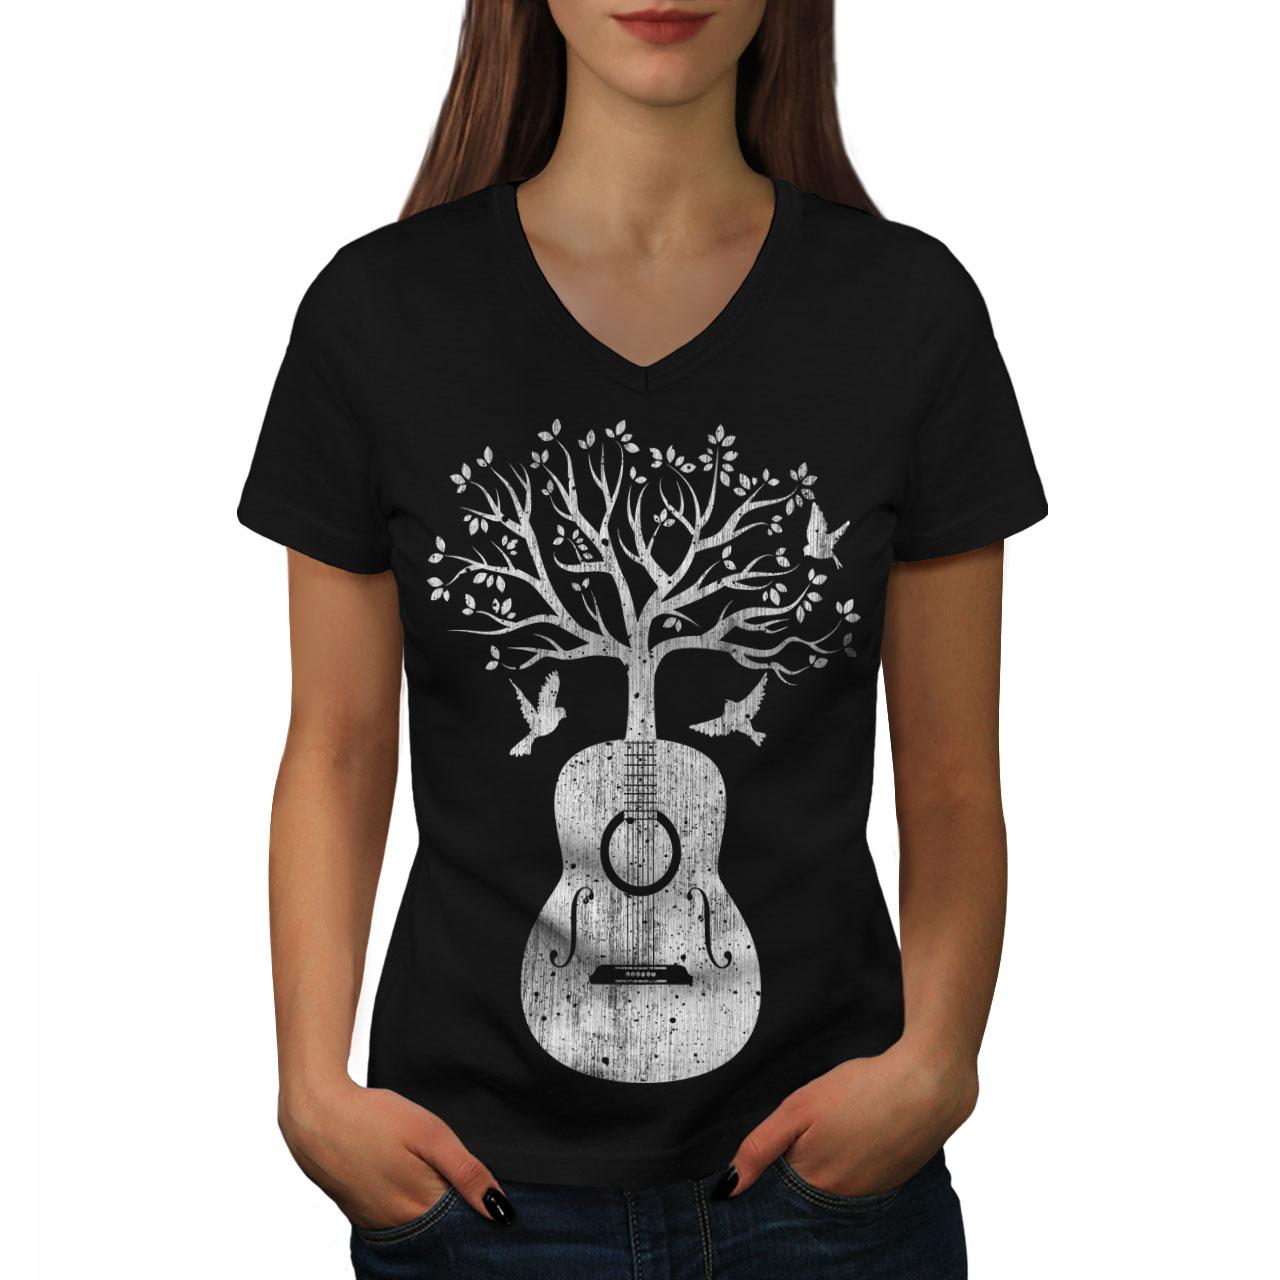 Wellcoda-Guitar-Music-Tree-Womens-V-Neck-T-shirt-Life-Graphic-Design-Tee thumbnail 3